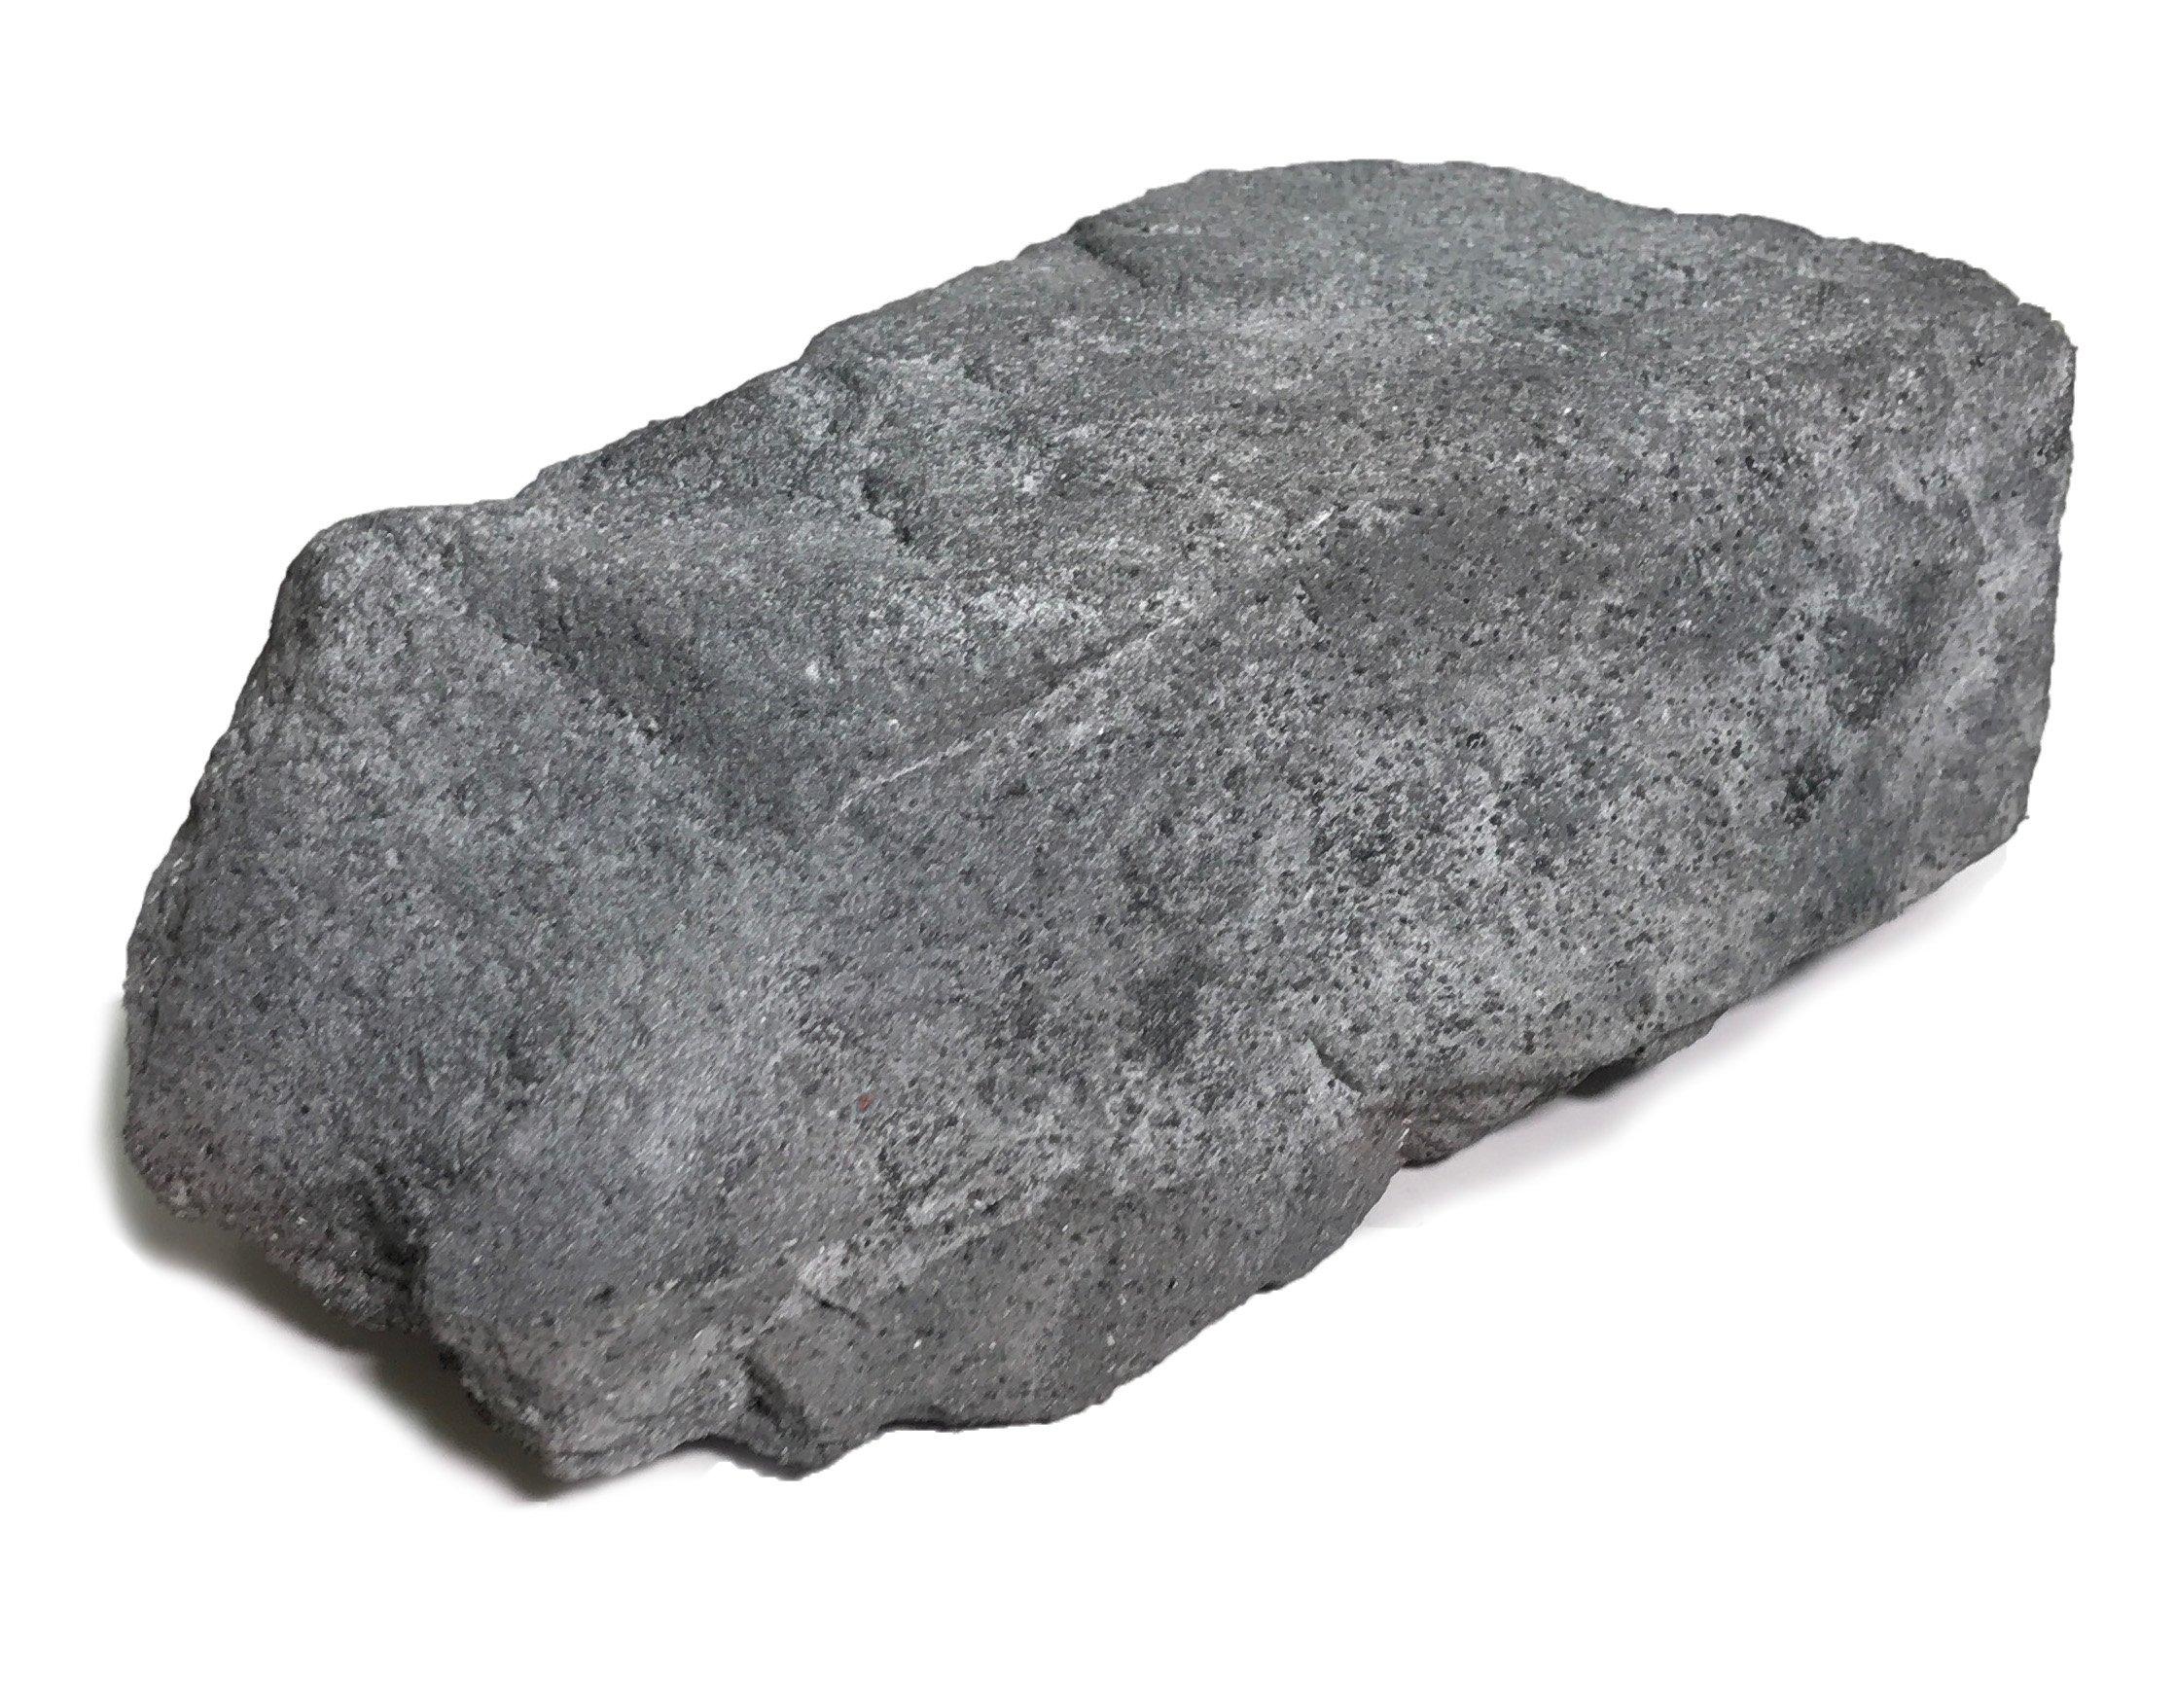 Foam Rubber Stunt Large Granite Fake Rock Prop by NewRuleFX (Image #3)